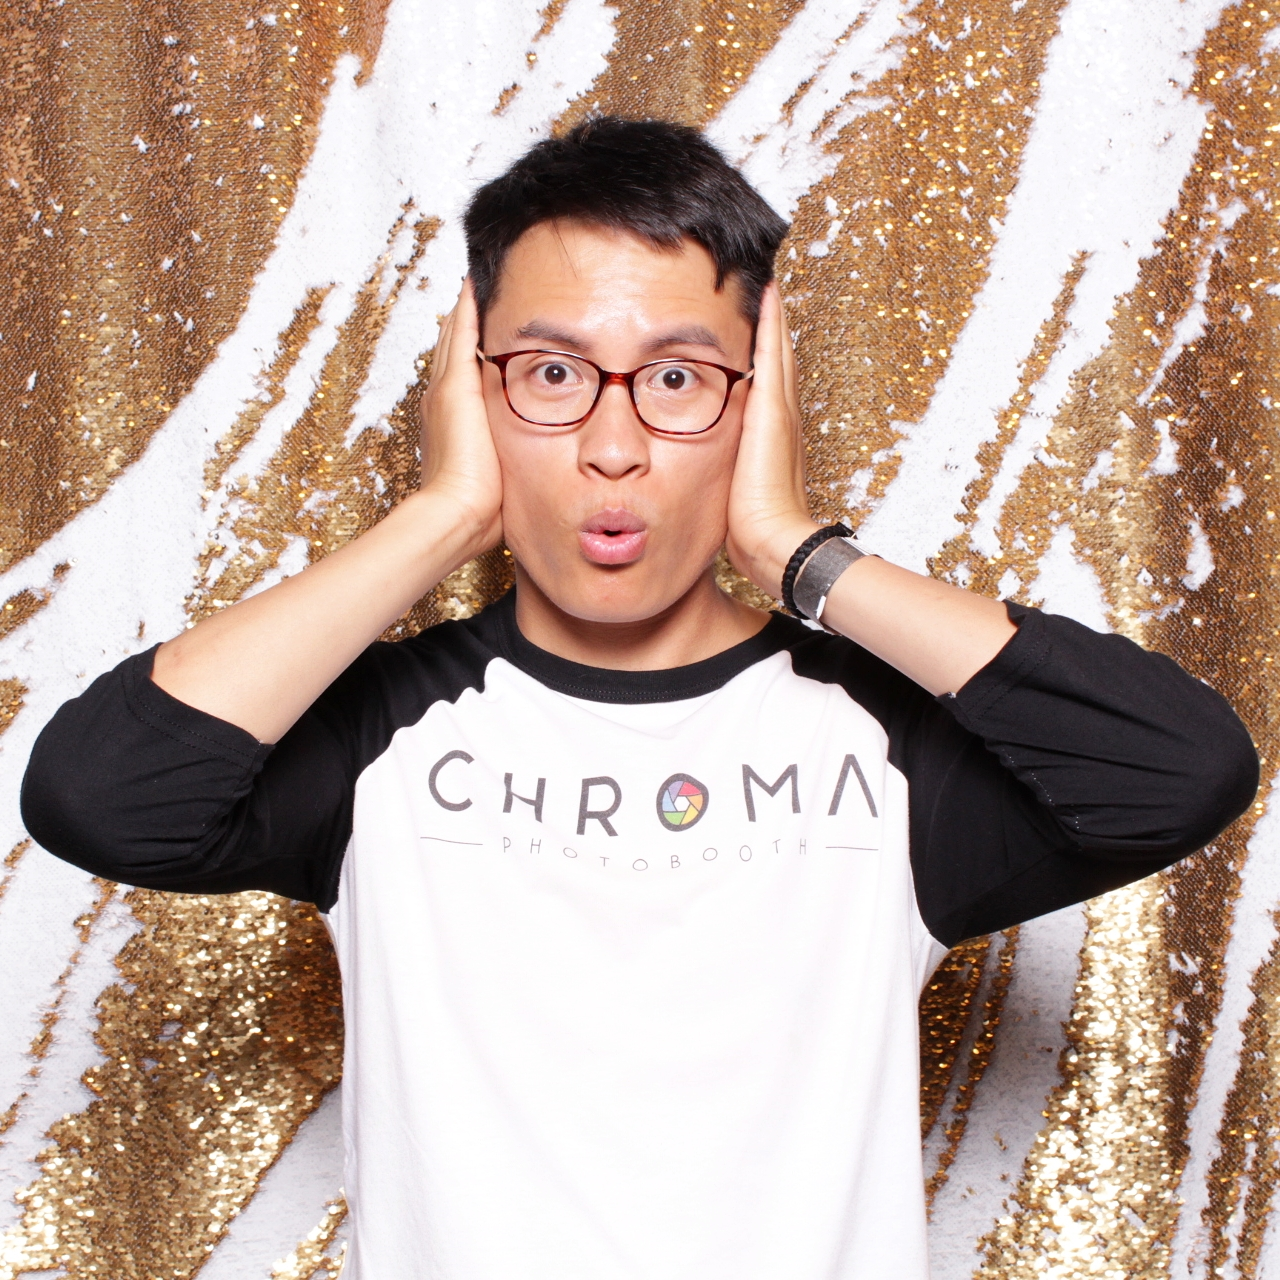 chroma photobooth carat MERMAID SEQUIN